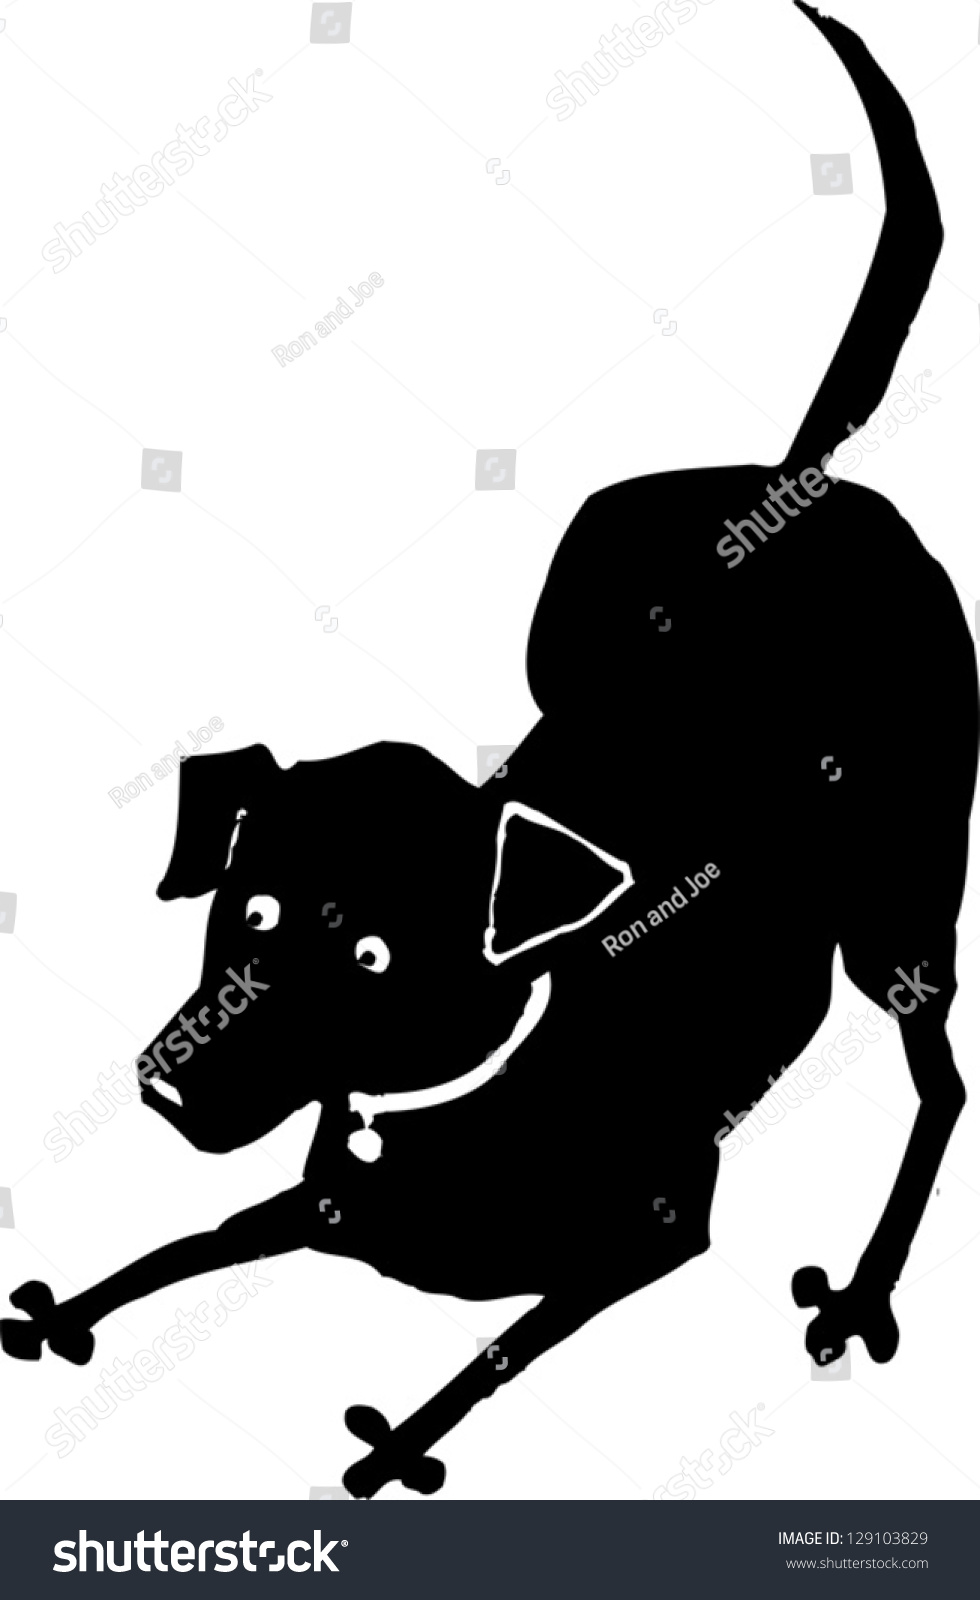 Black White Vector Illustration Dog Playing Stock Vector ...